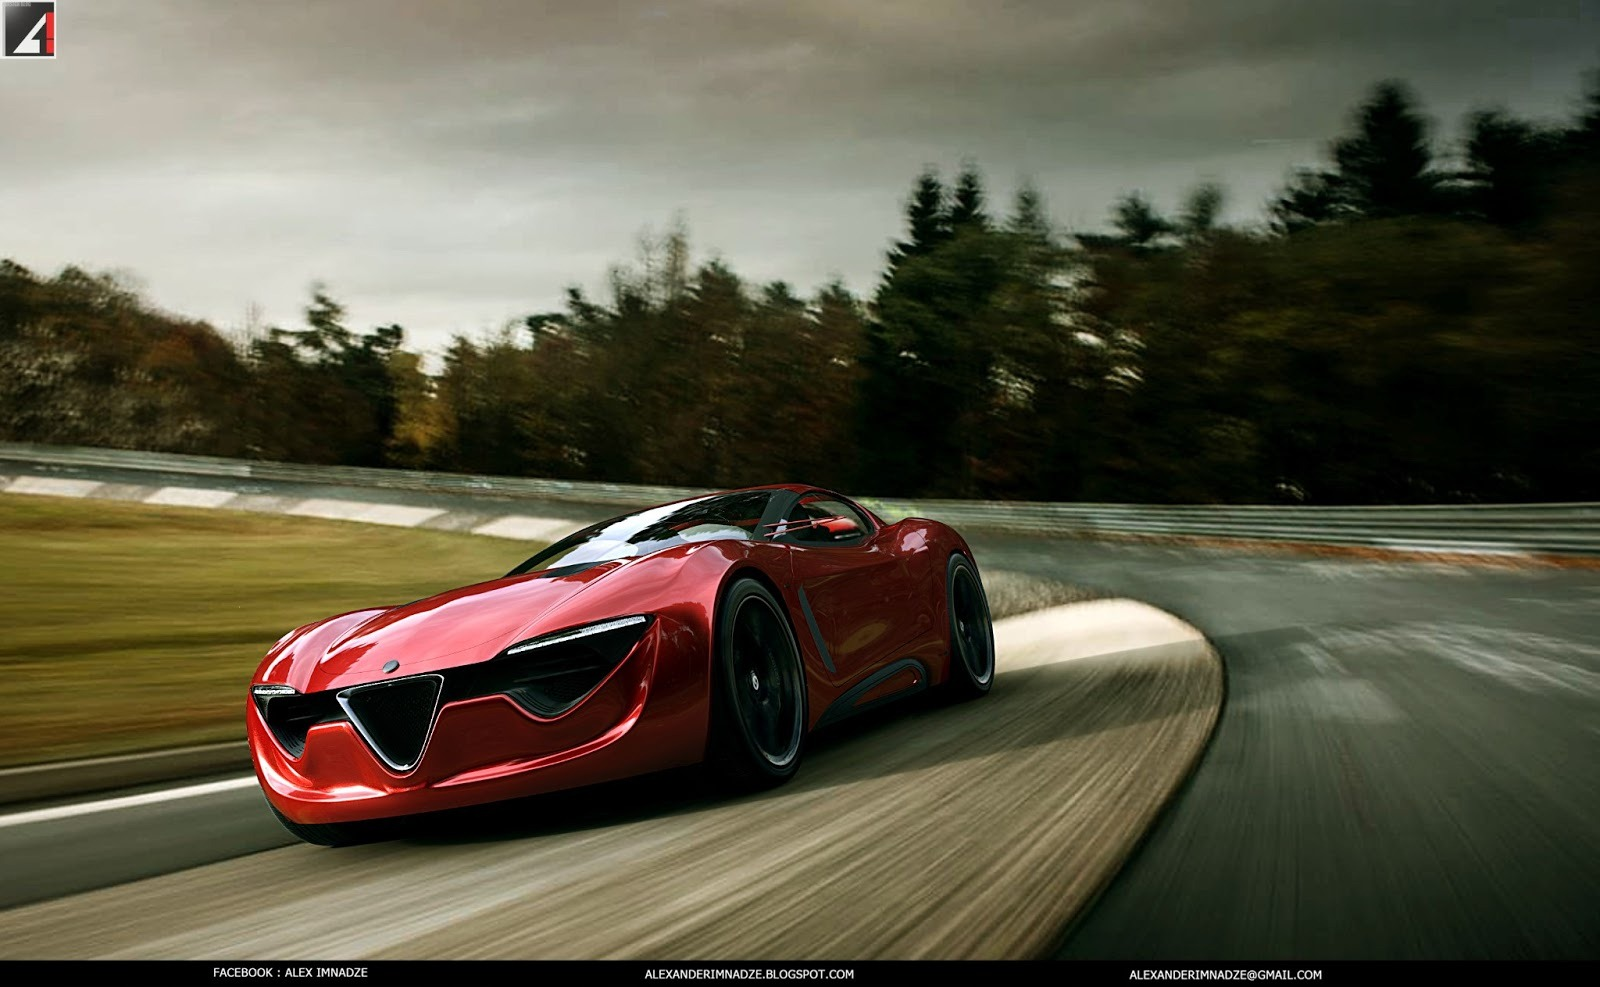 2017 Alfa Romeo 4c >> Alfa Romeo 6C Concept - the Italian Musclecar - autoevolution